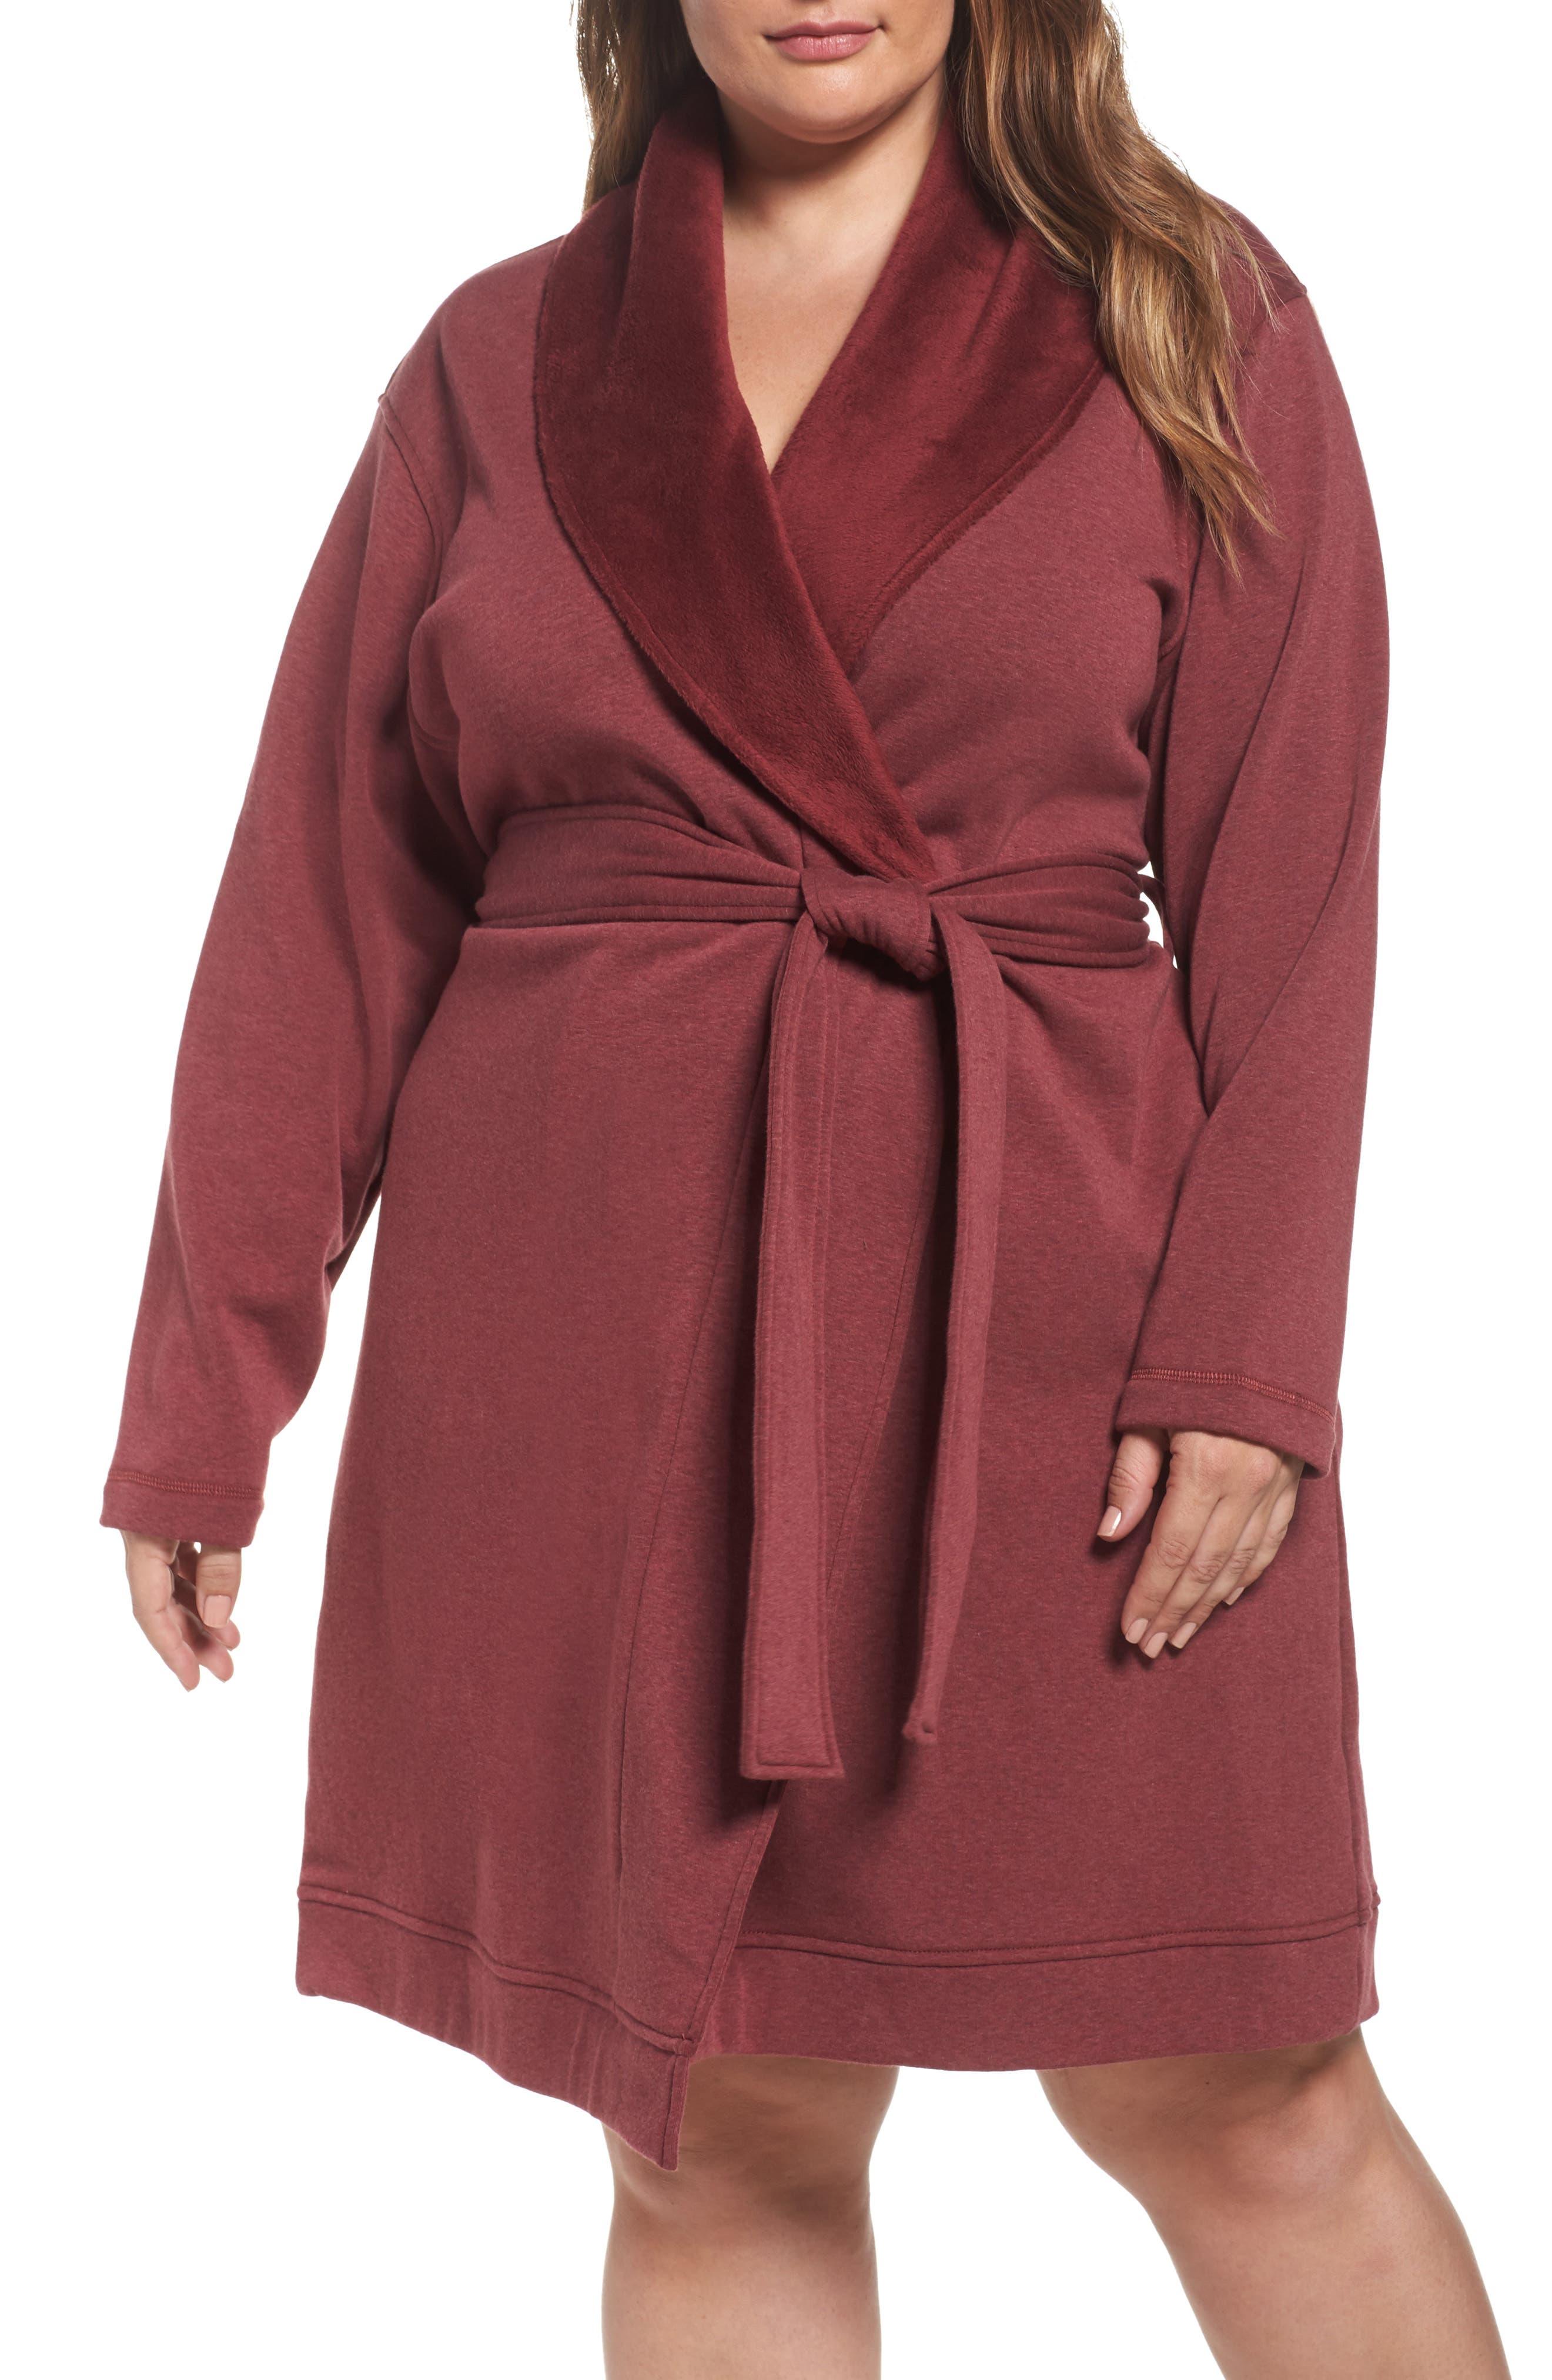 Alternate Image 1 Selected - UGG® 'Blanche' Plush Shawl Collar Robe (Plus Size)